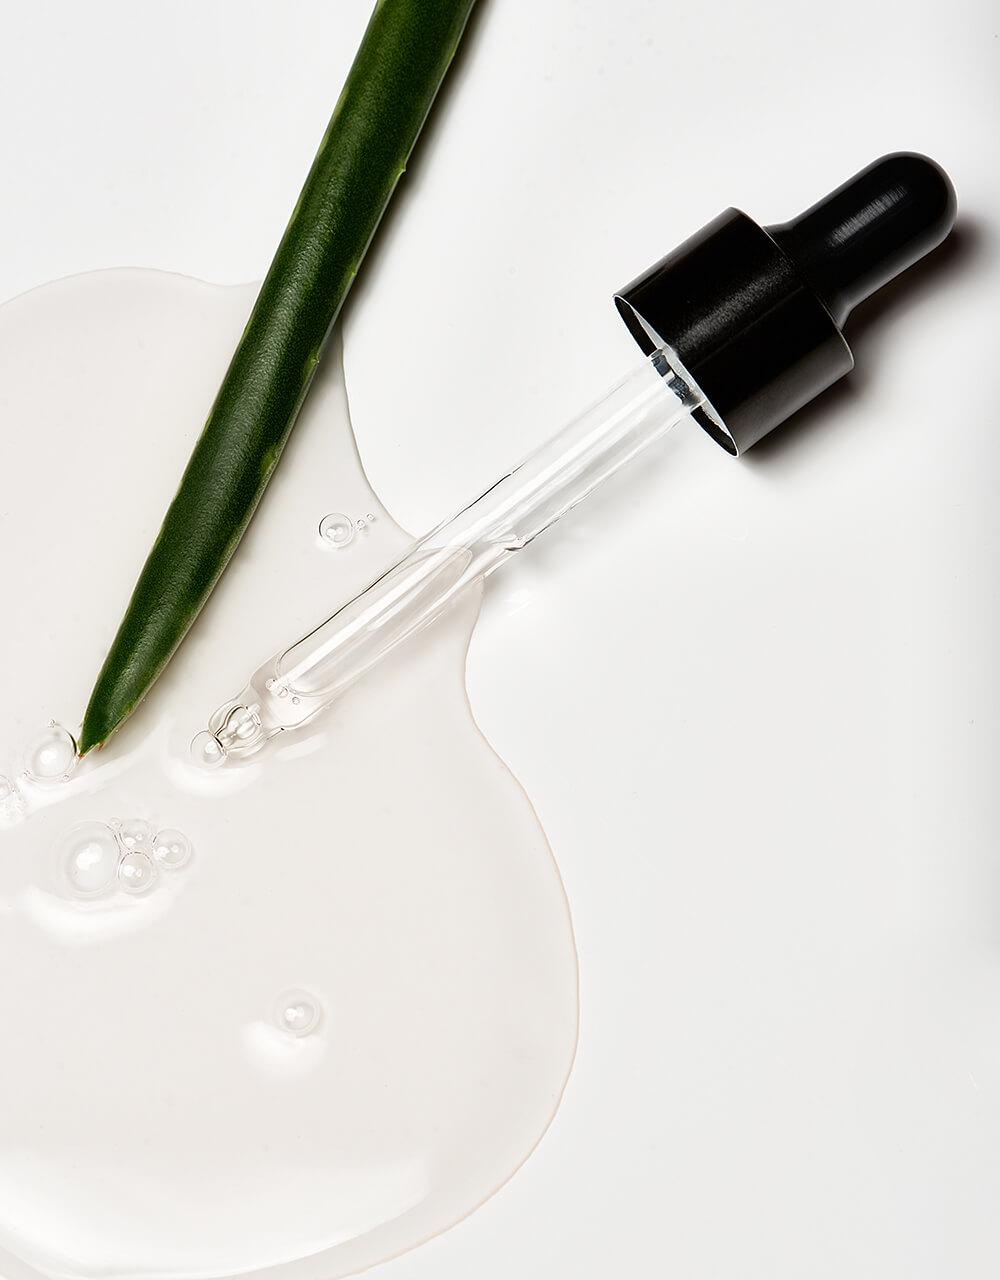 Serum Aloe Vera Produktfoto Mona Strieder